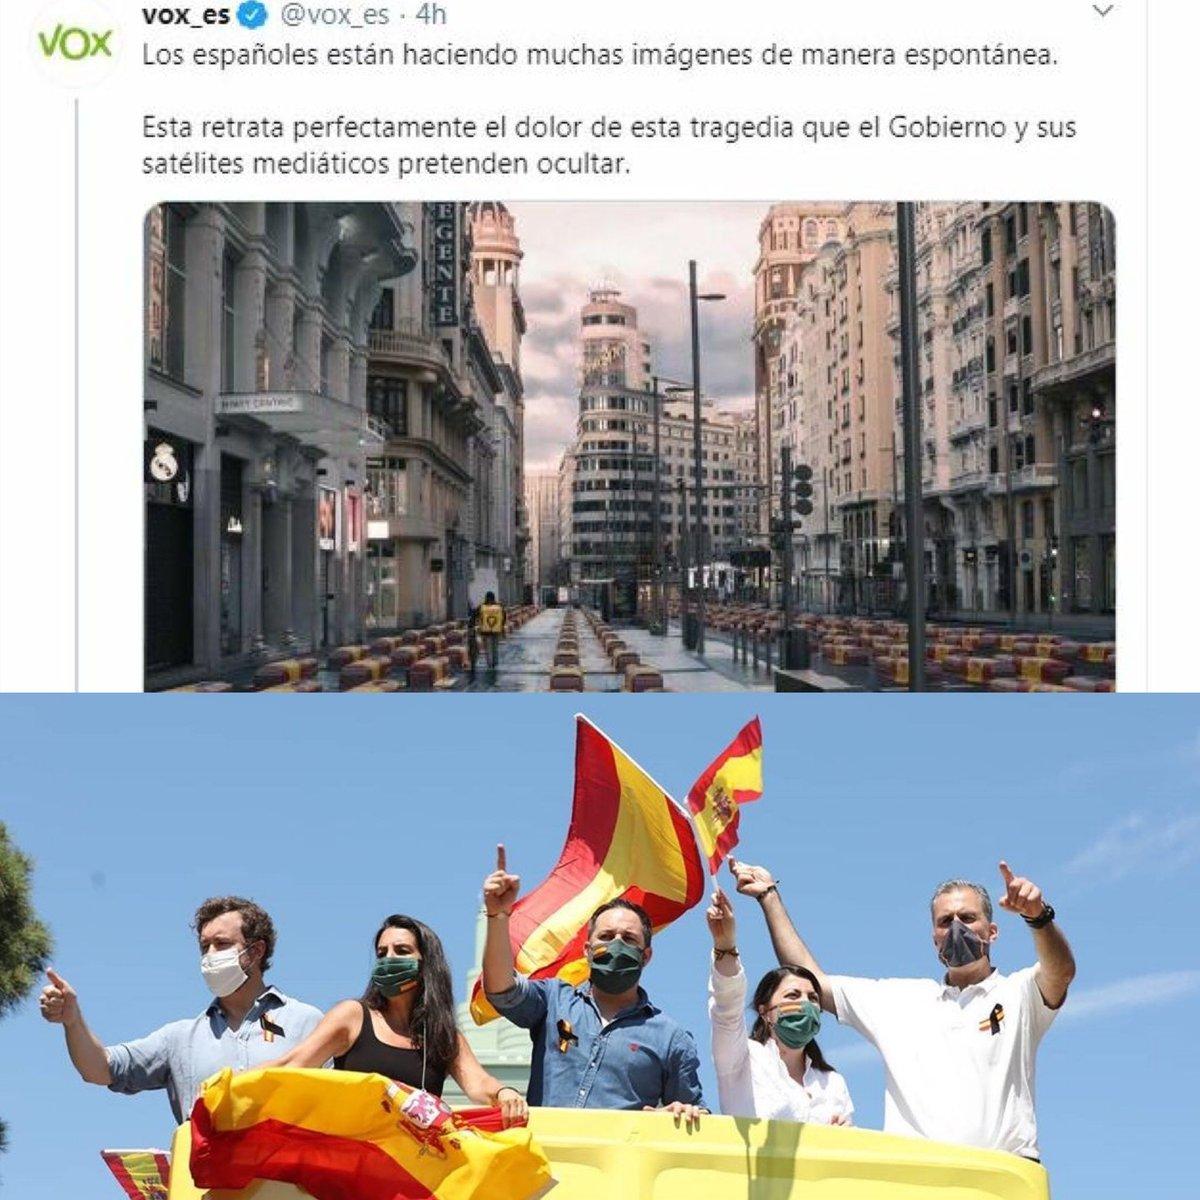 Dos imagenes juntas se entienden mejor! #ElVirusSoisVoxotros #VOXMITIVOX